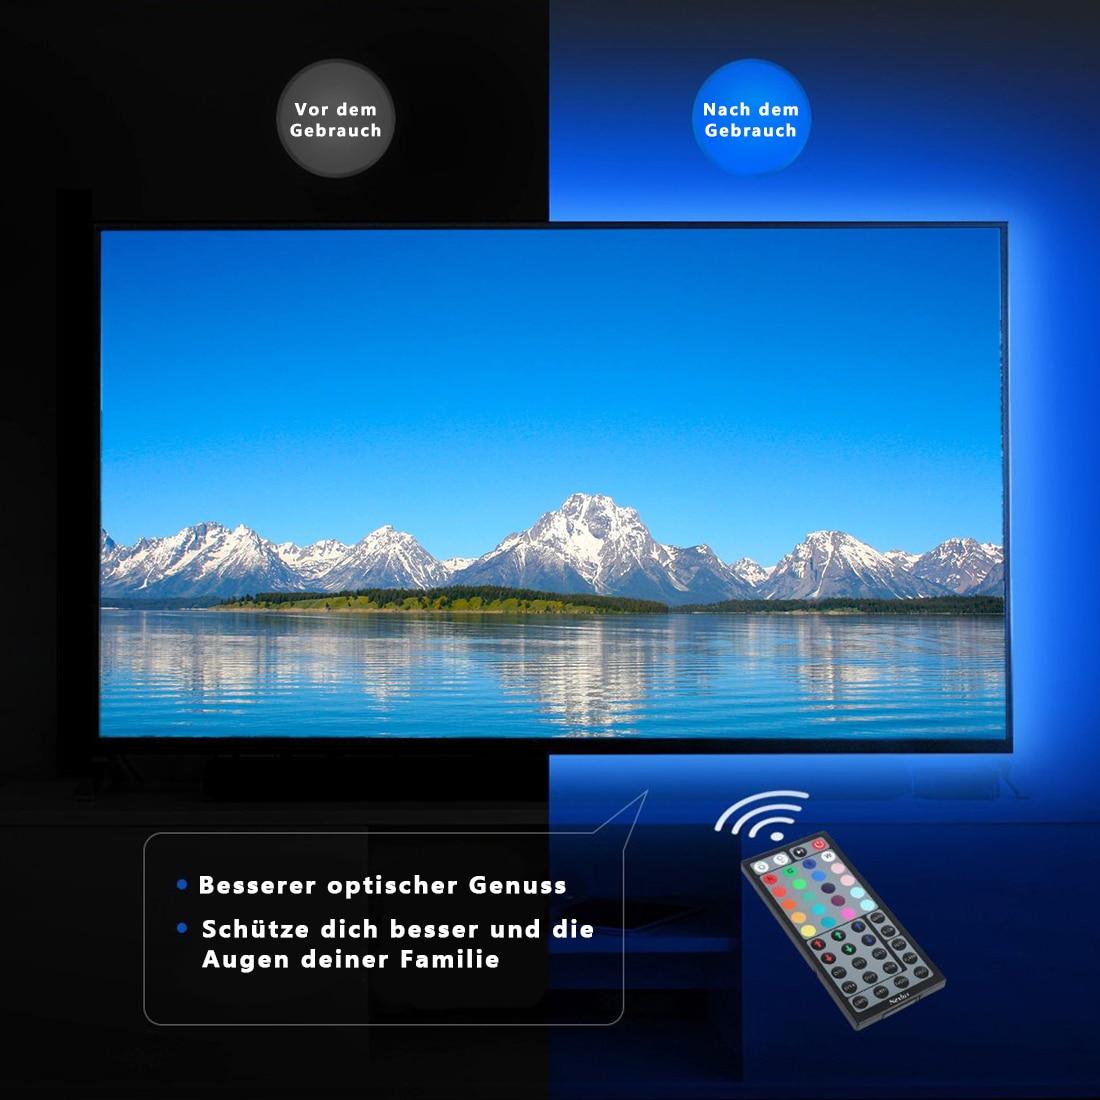 LED Strip Waterproof 2M 120LED DC 5V SMD 5050 RGB RGBW RGBWW Fita LED Light Strips Flexible Neon Tape